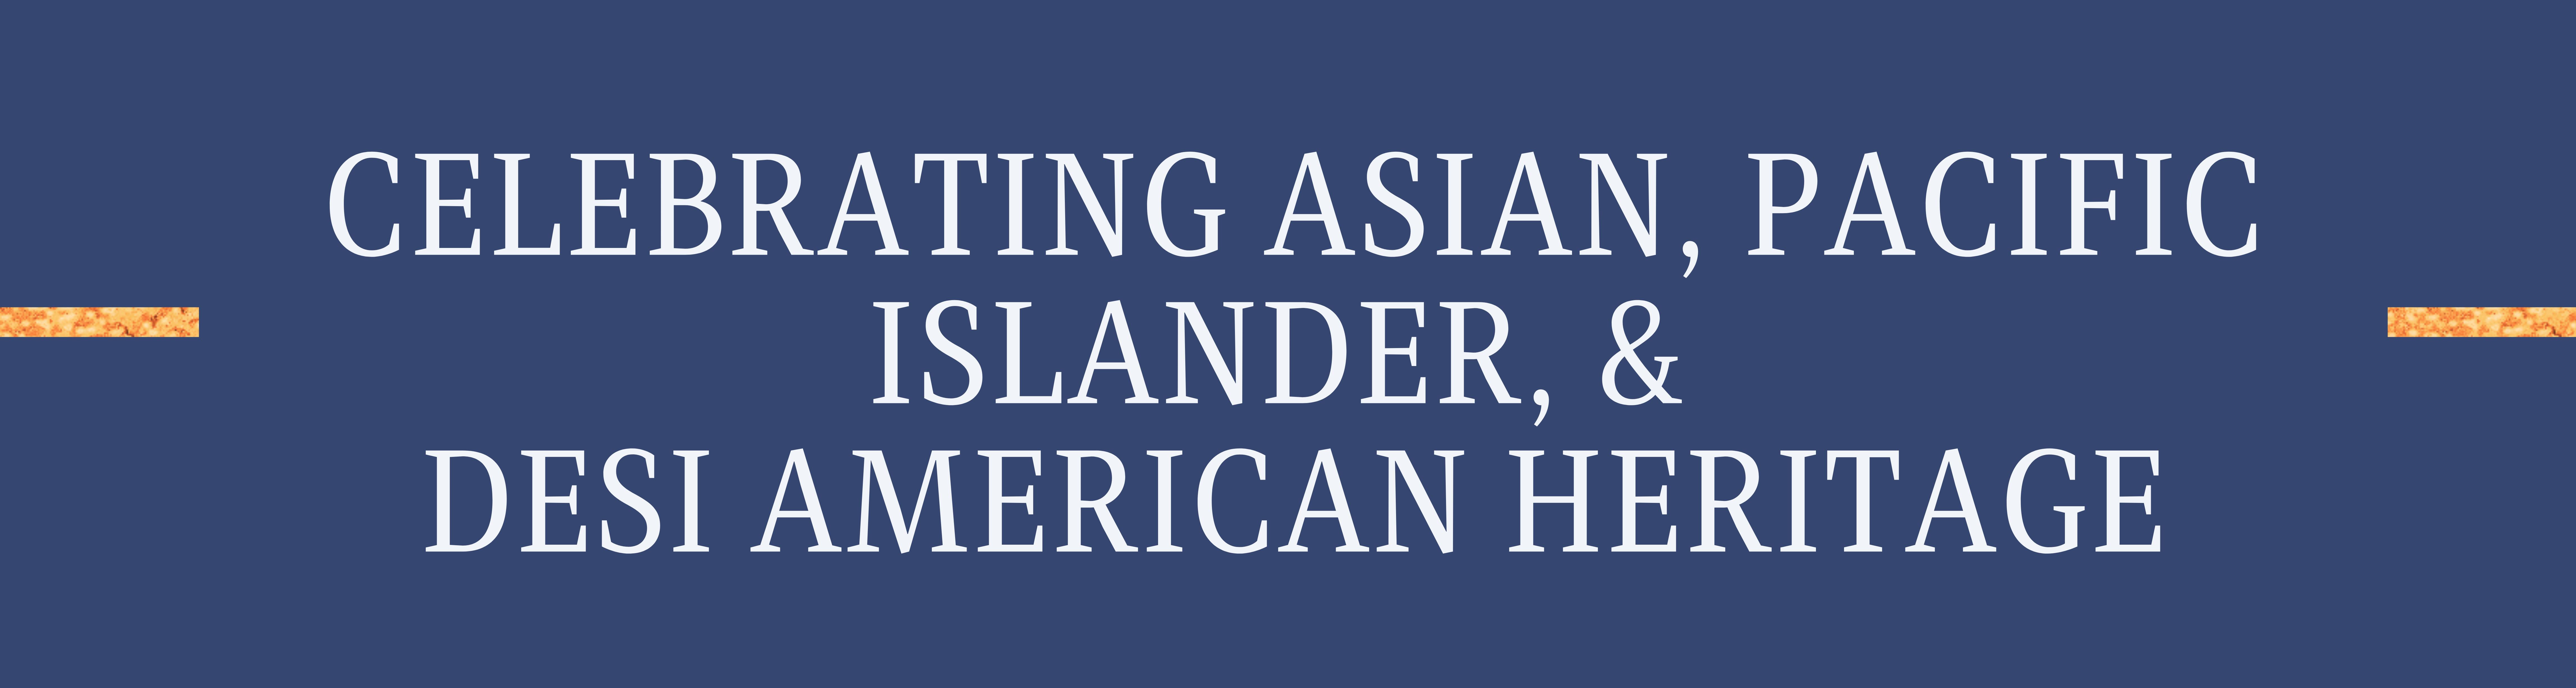 Image says celebrating Asian, Pacific Islander, & Desi American Heritage